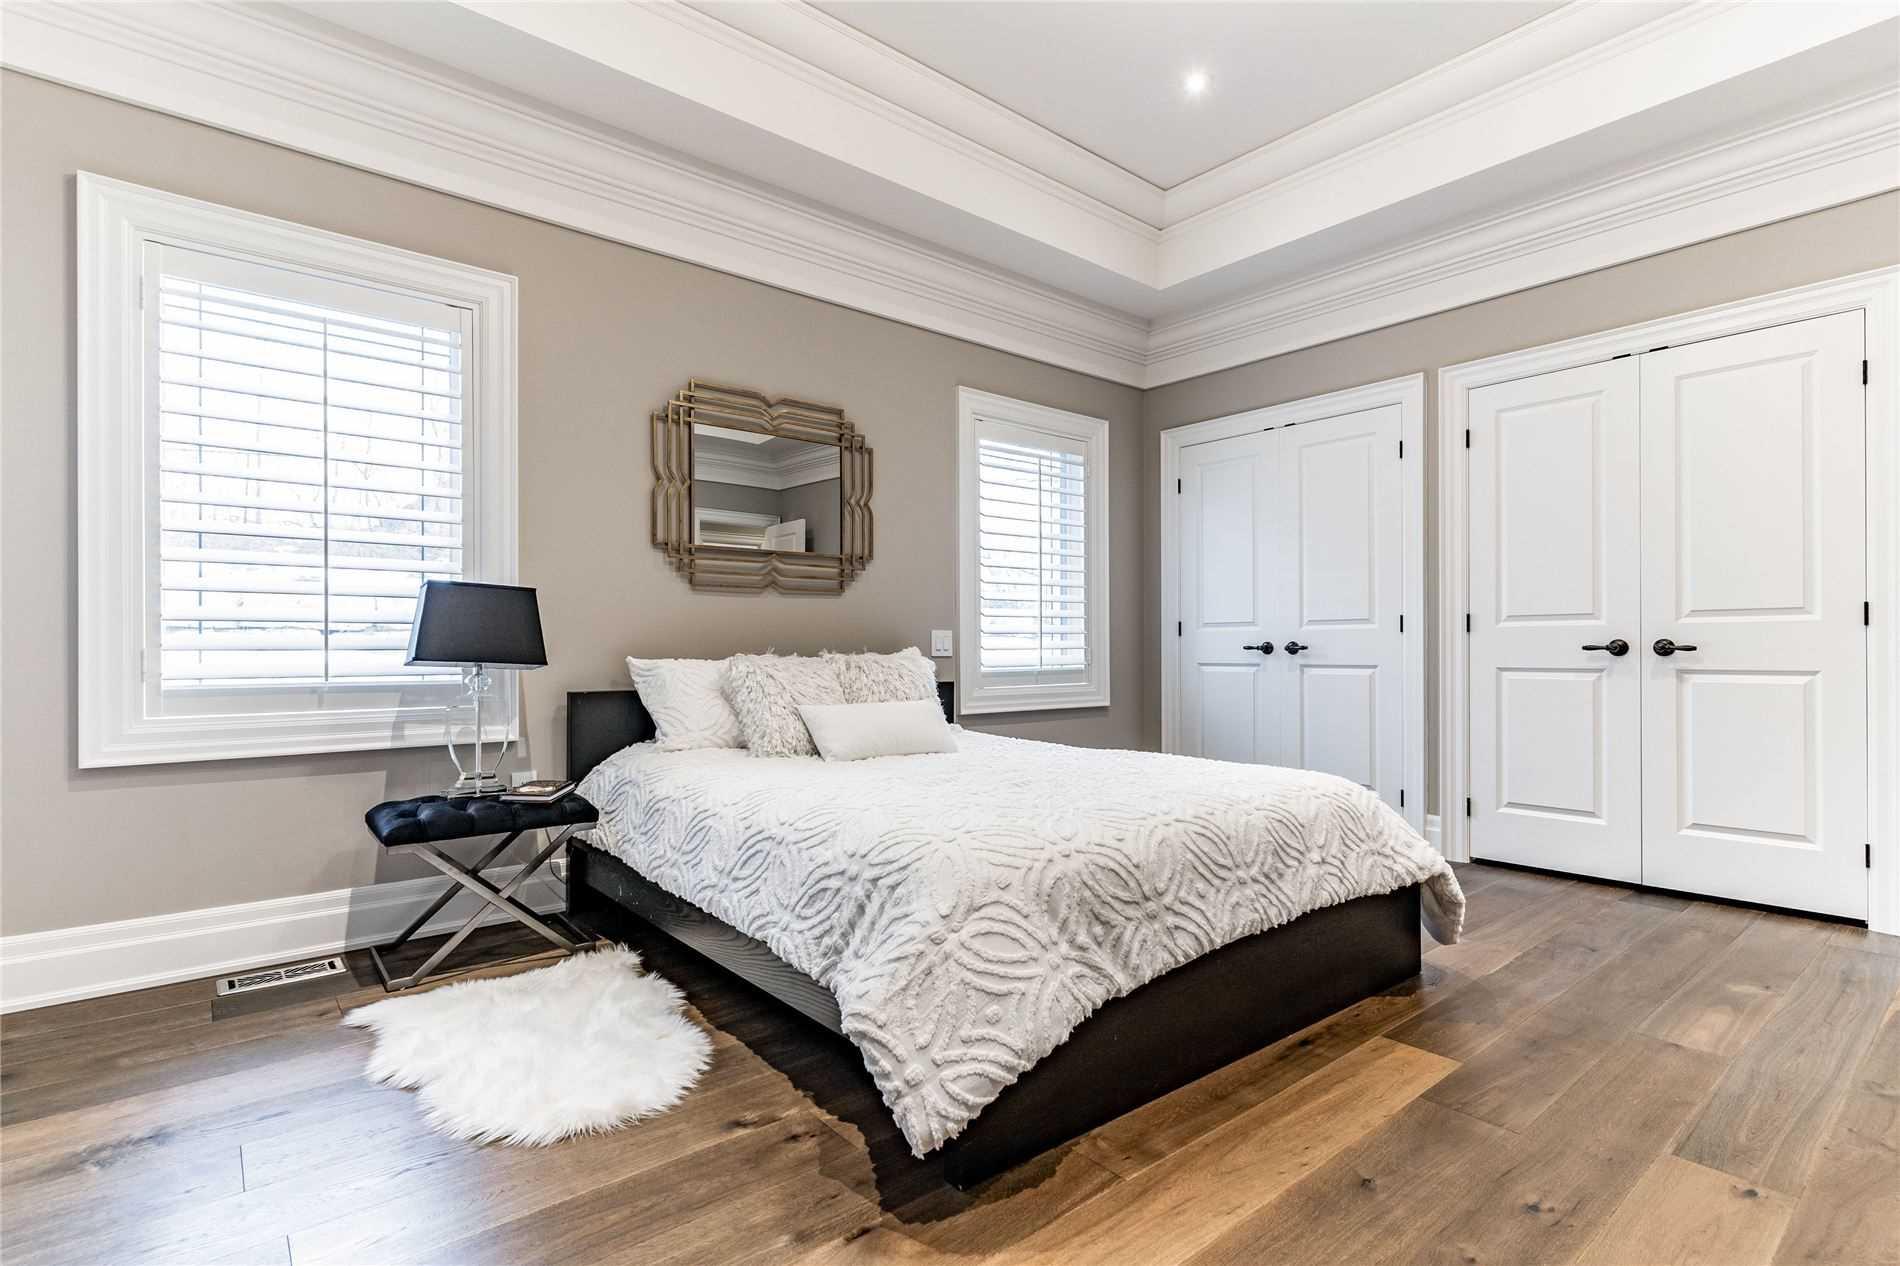 505 Hamilton Dr, Hamilton, Ontario L9G 2A9, 6 Bedrooms Bedrooms, 12 Rooms Rooms,5 BathroomsBathrooms,Detached,For Sale,Hamilton,X5151905